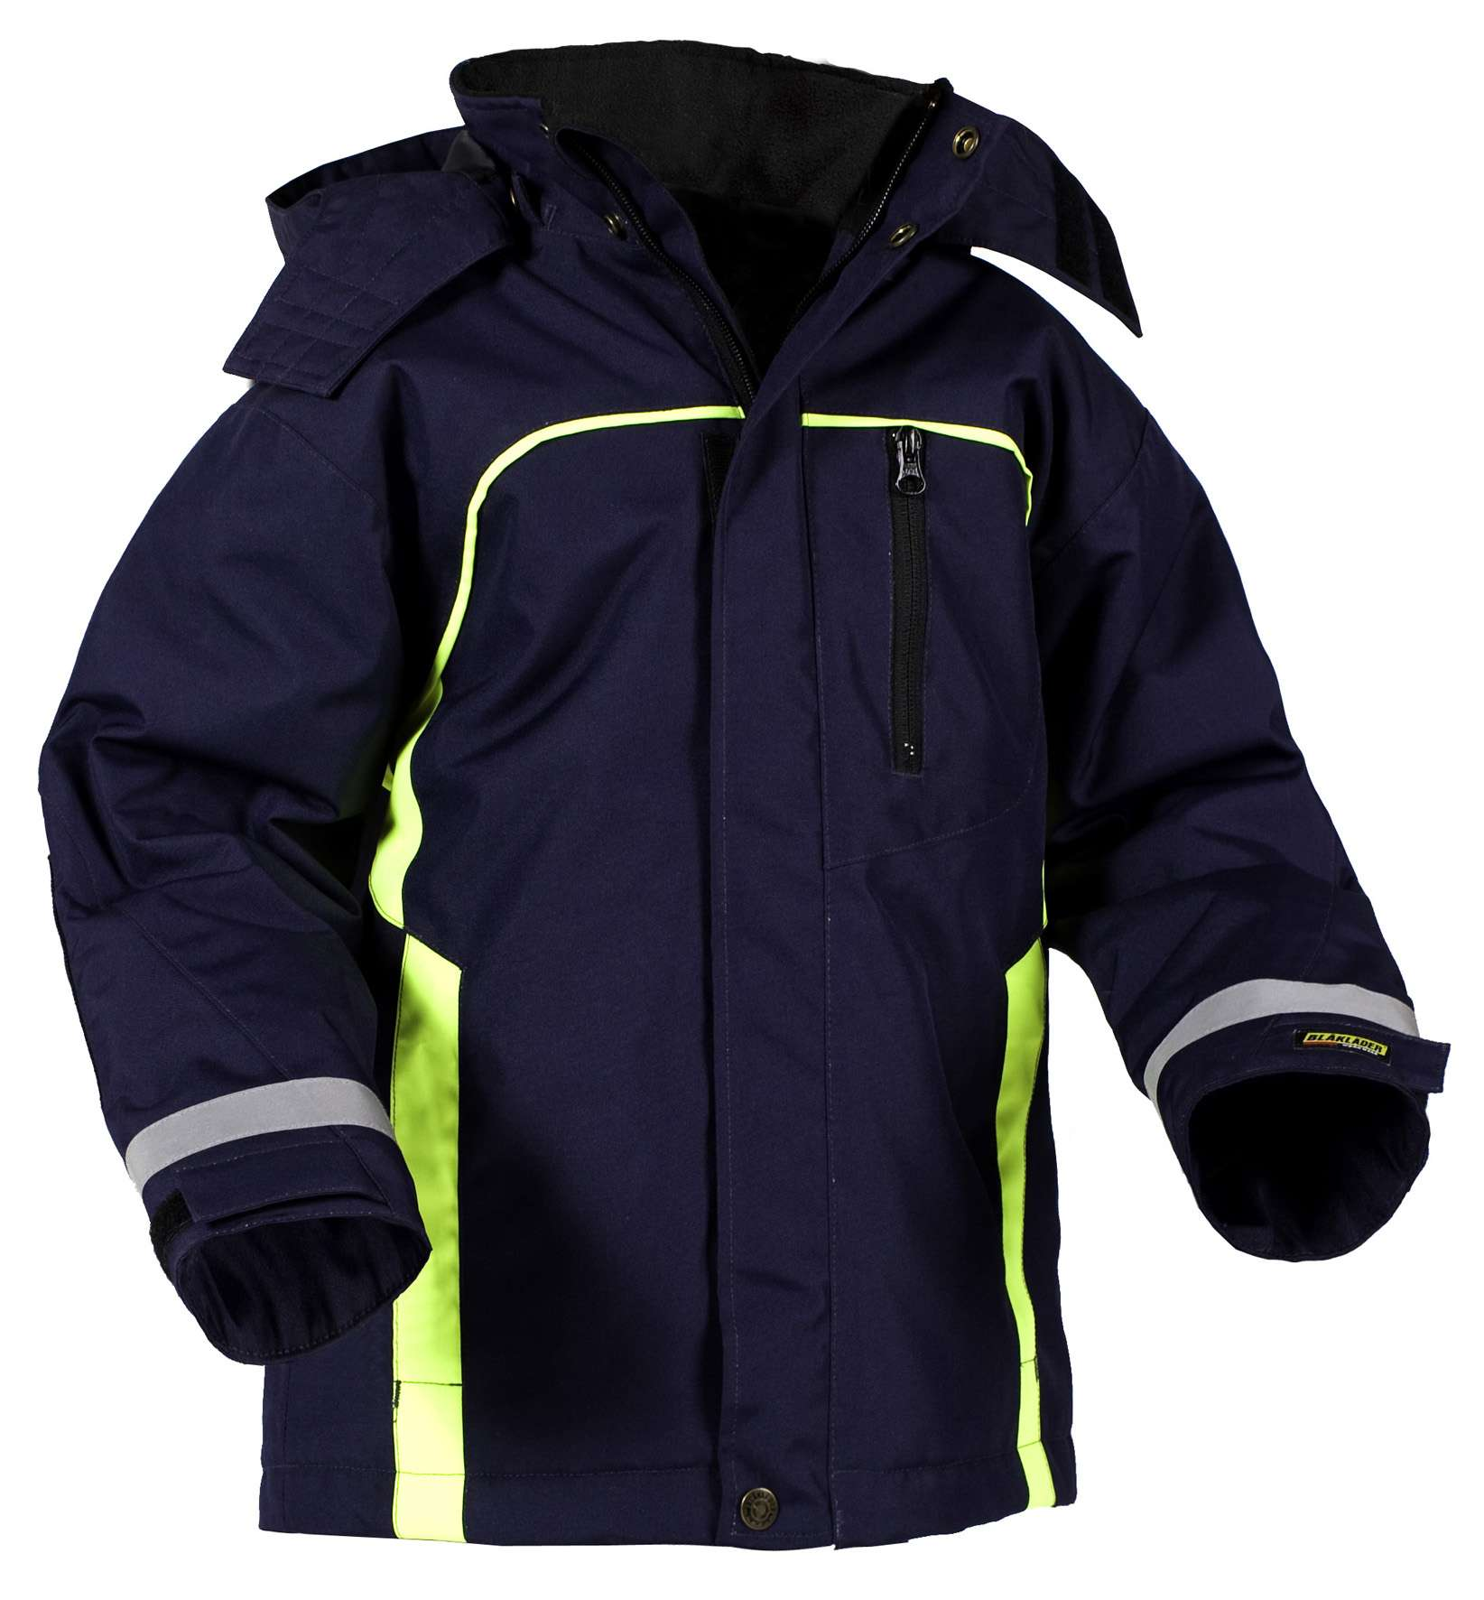 Blaklader Kinderkleding 48481977 marineblauw-geel(8933)